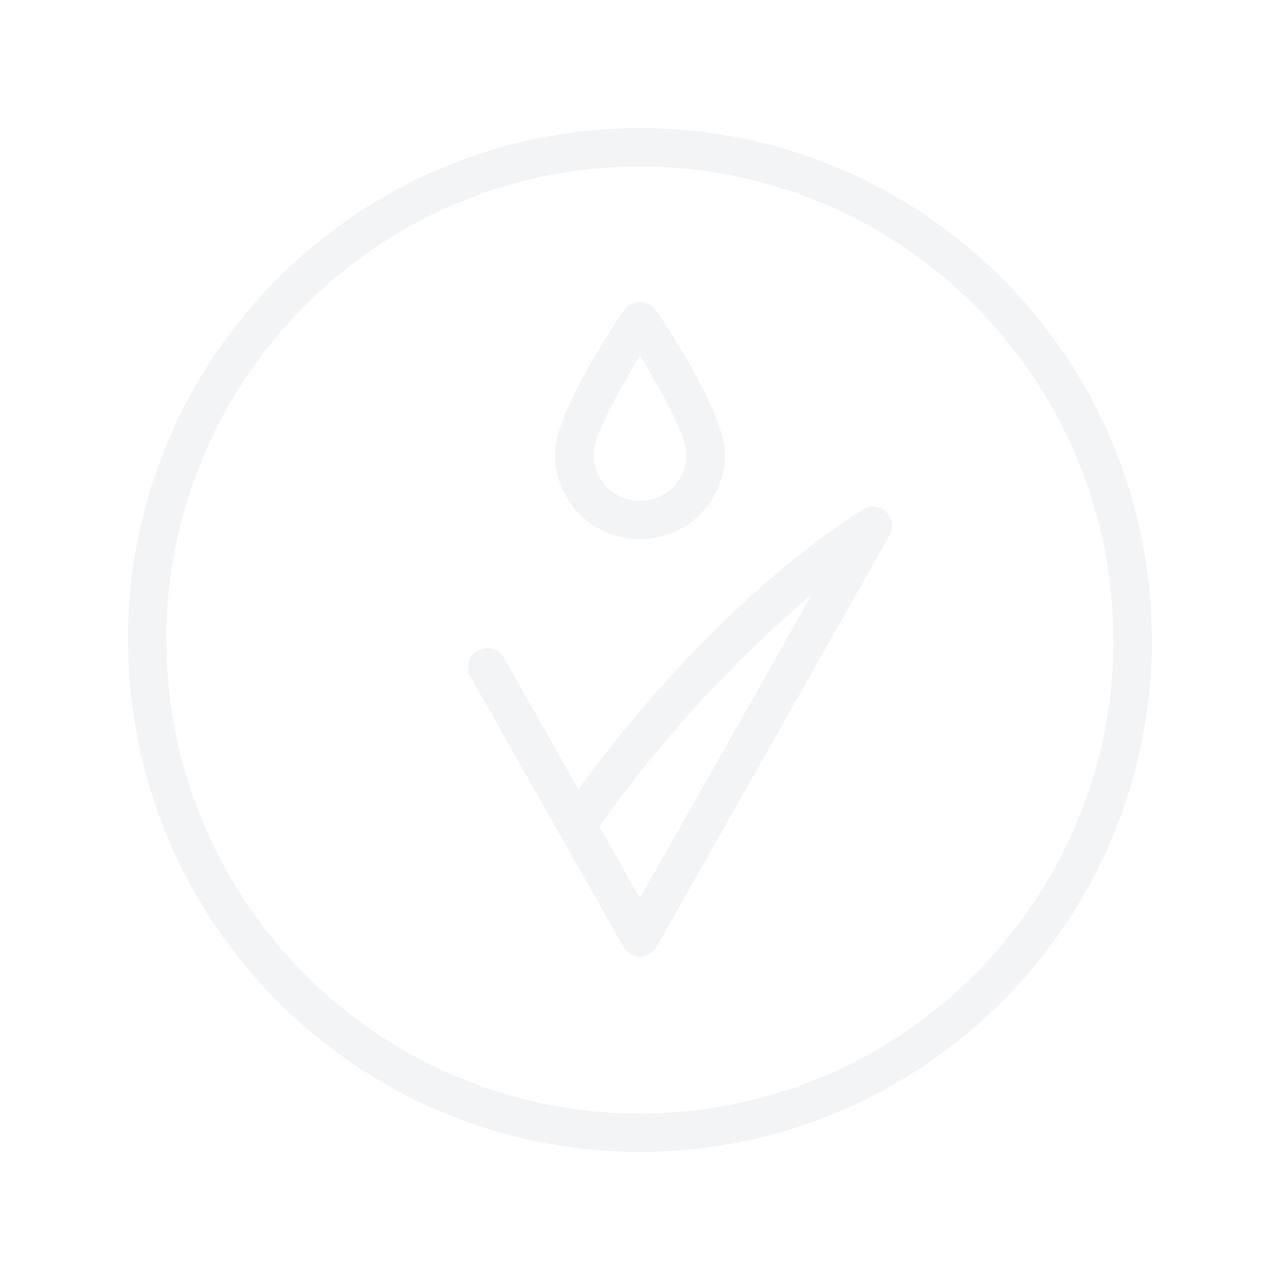 Everyday Minerals Semi-Matte Base 4.8g